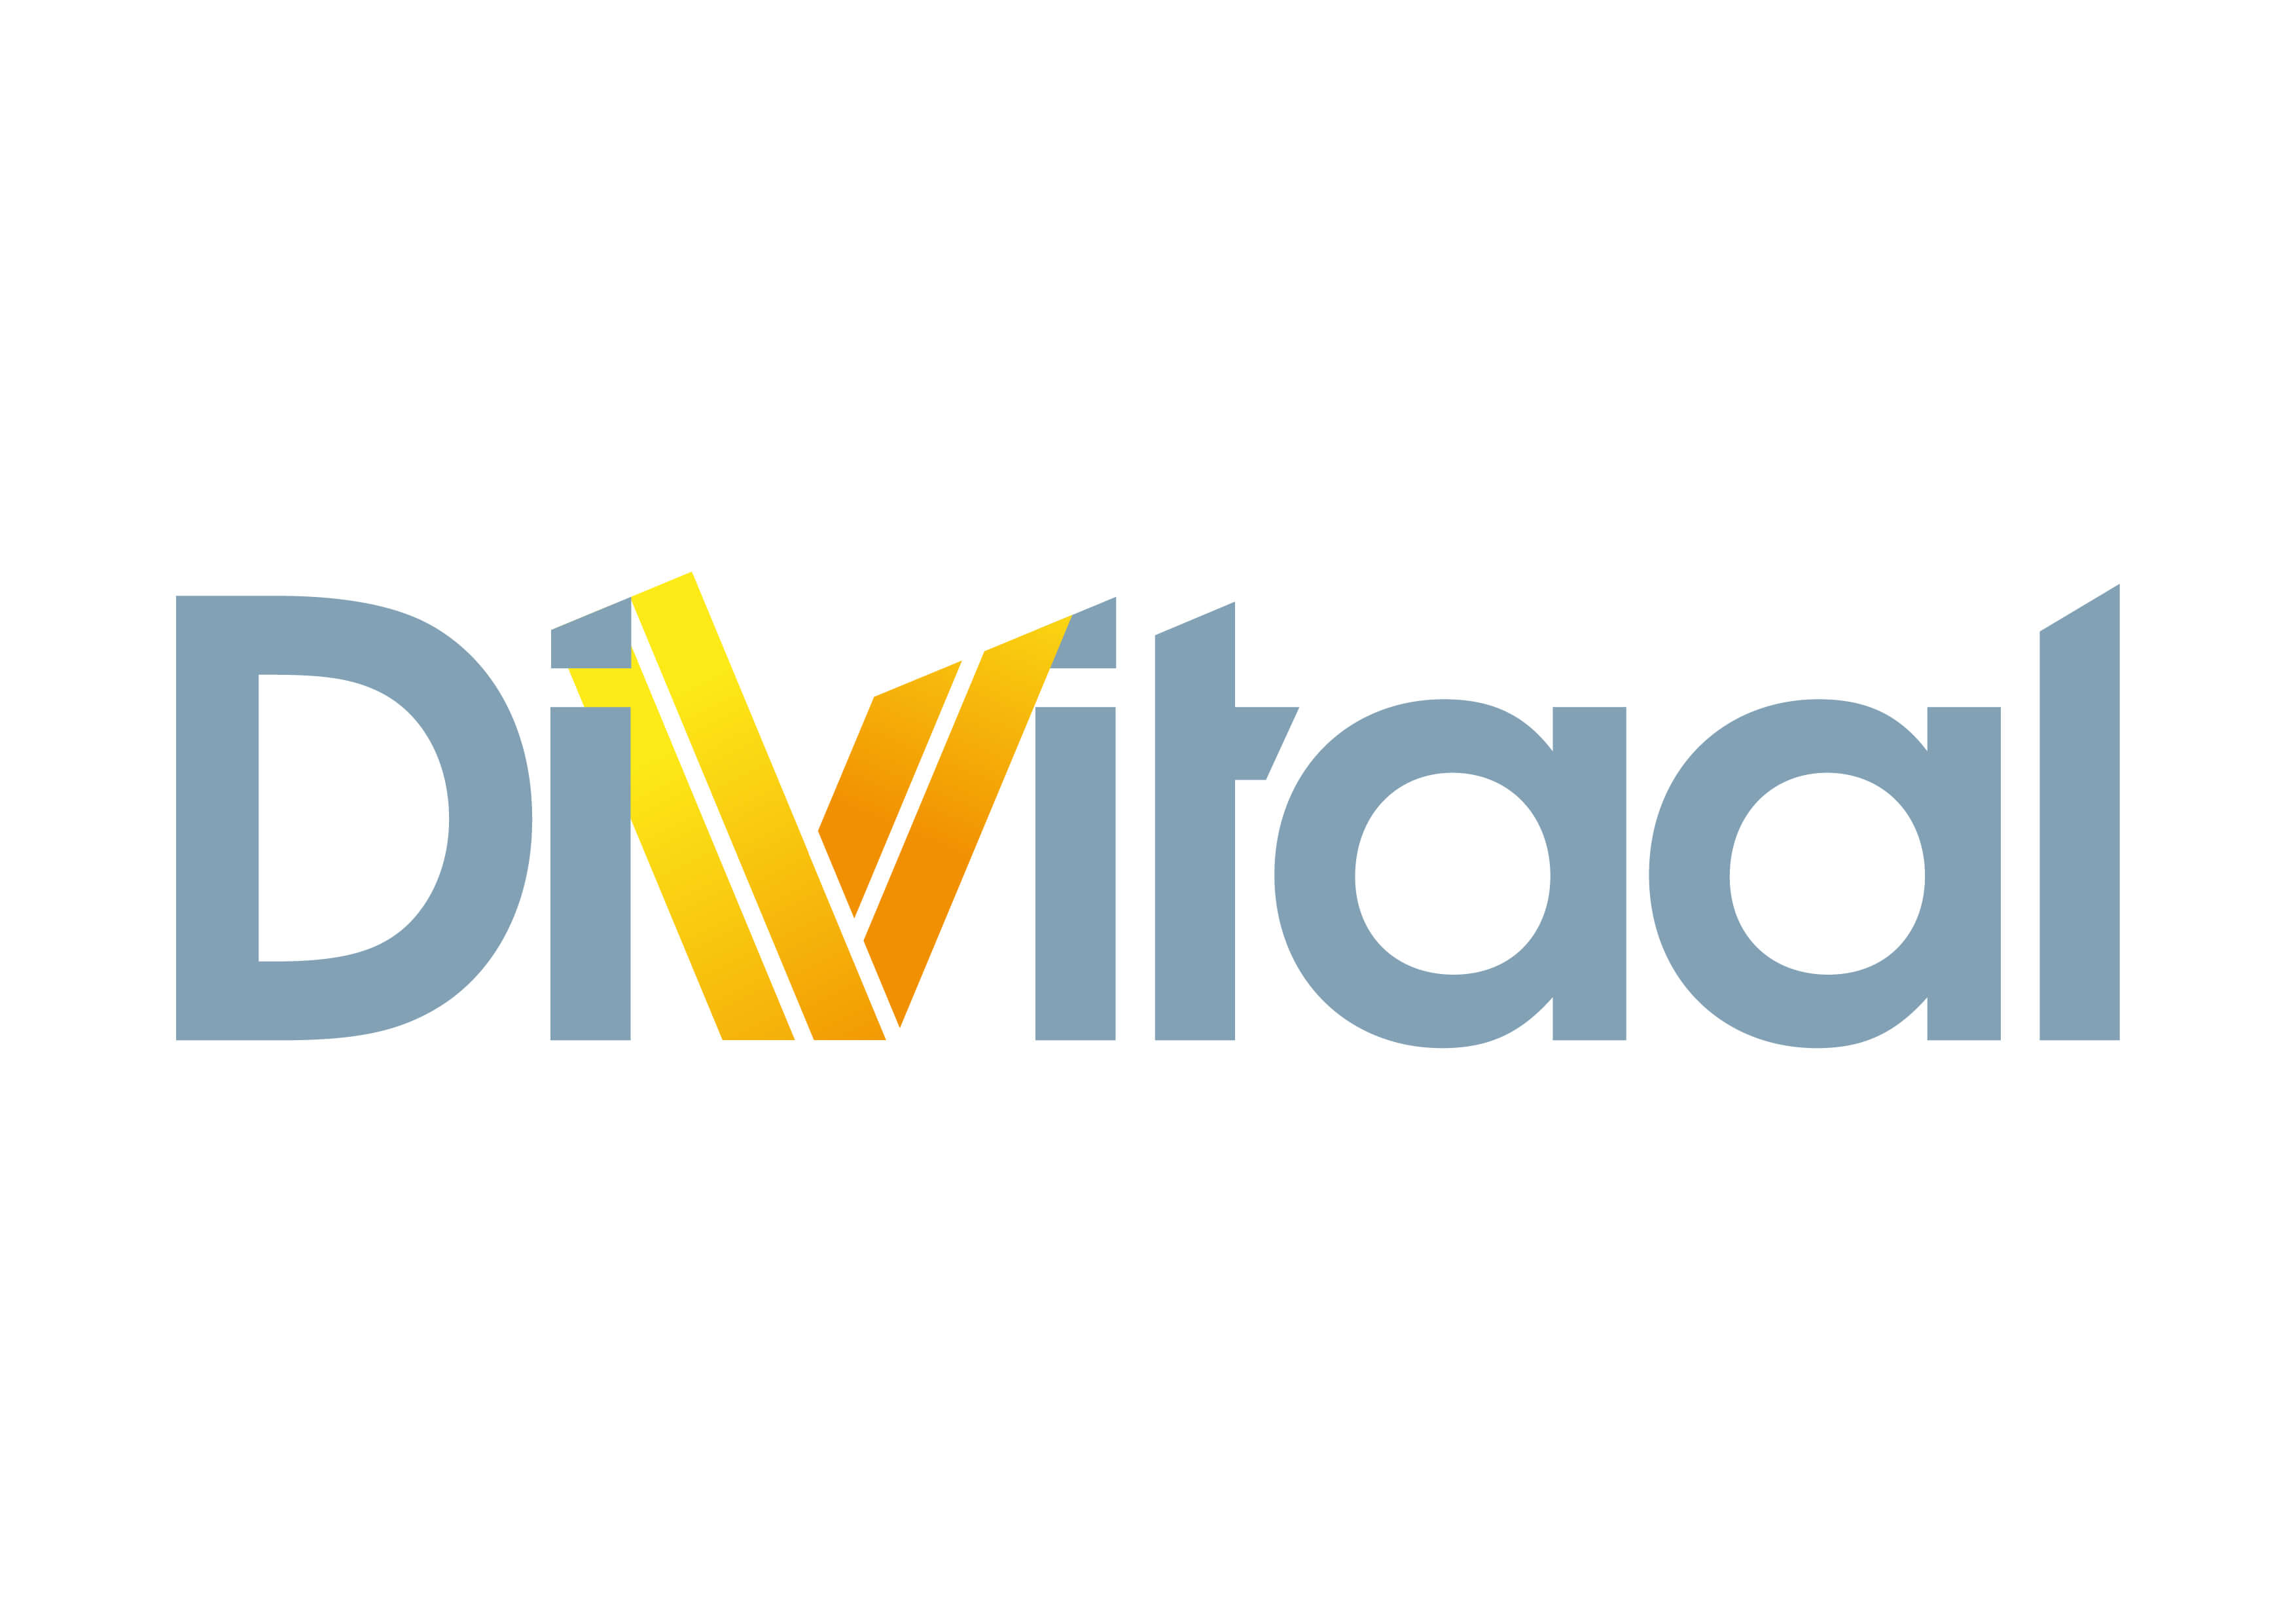 Divitaal